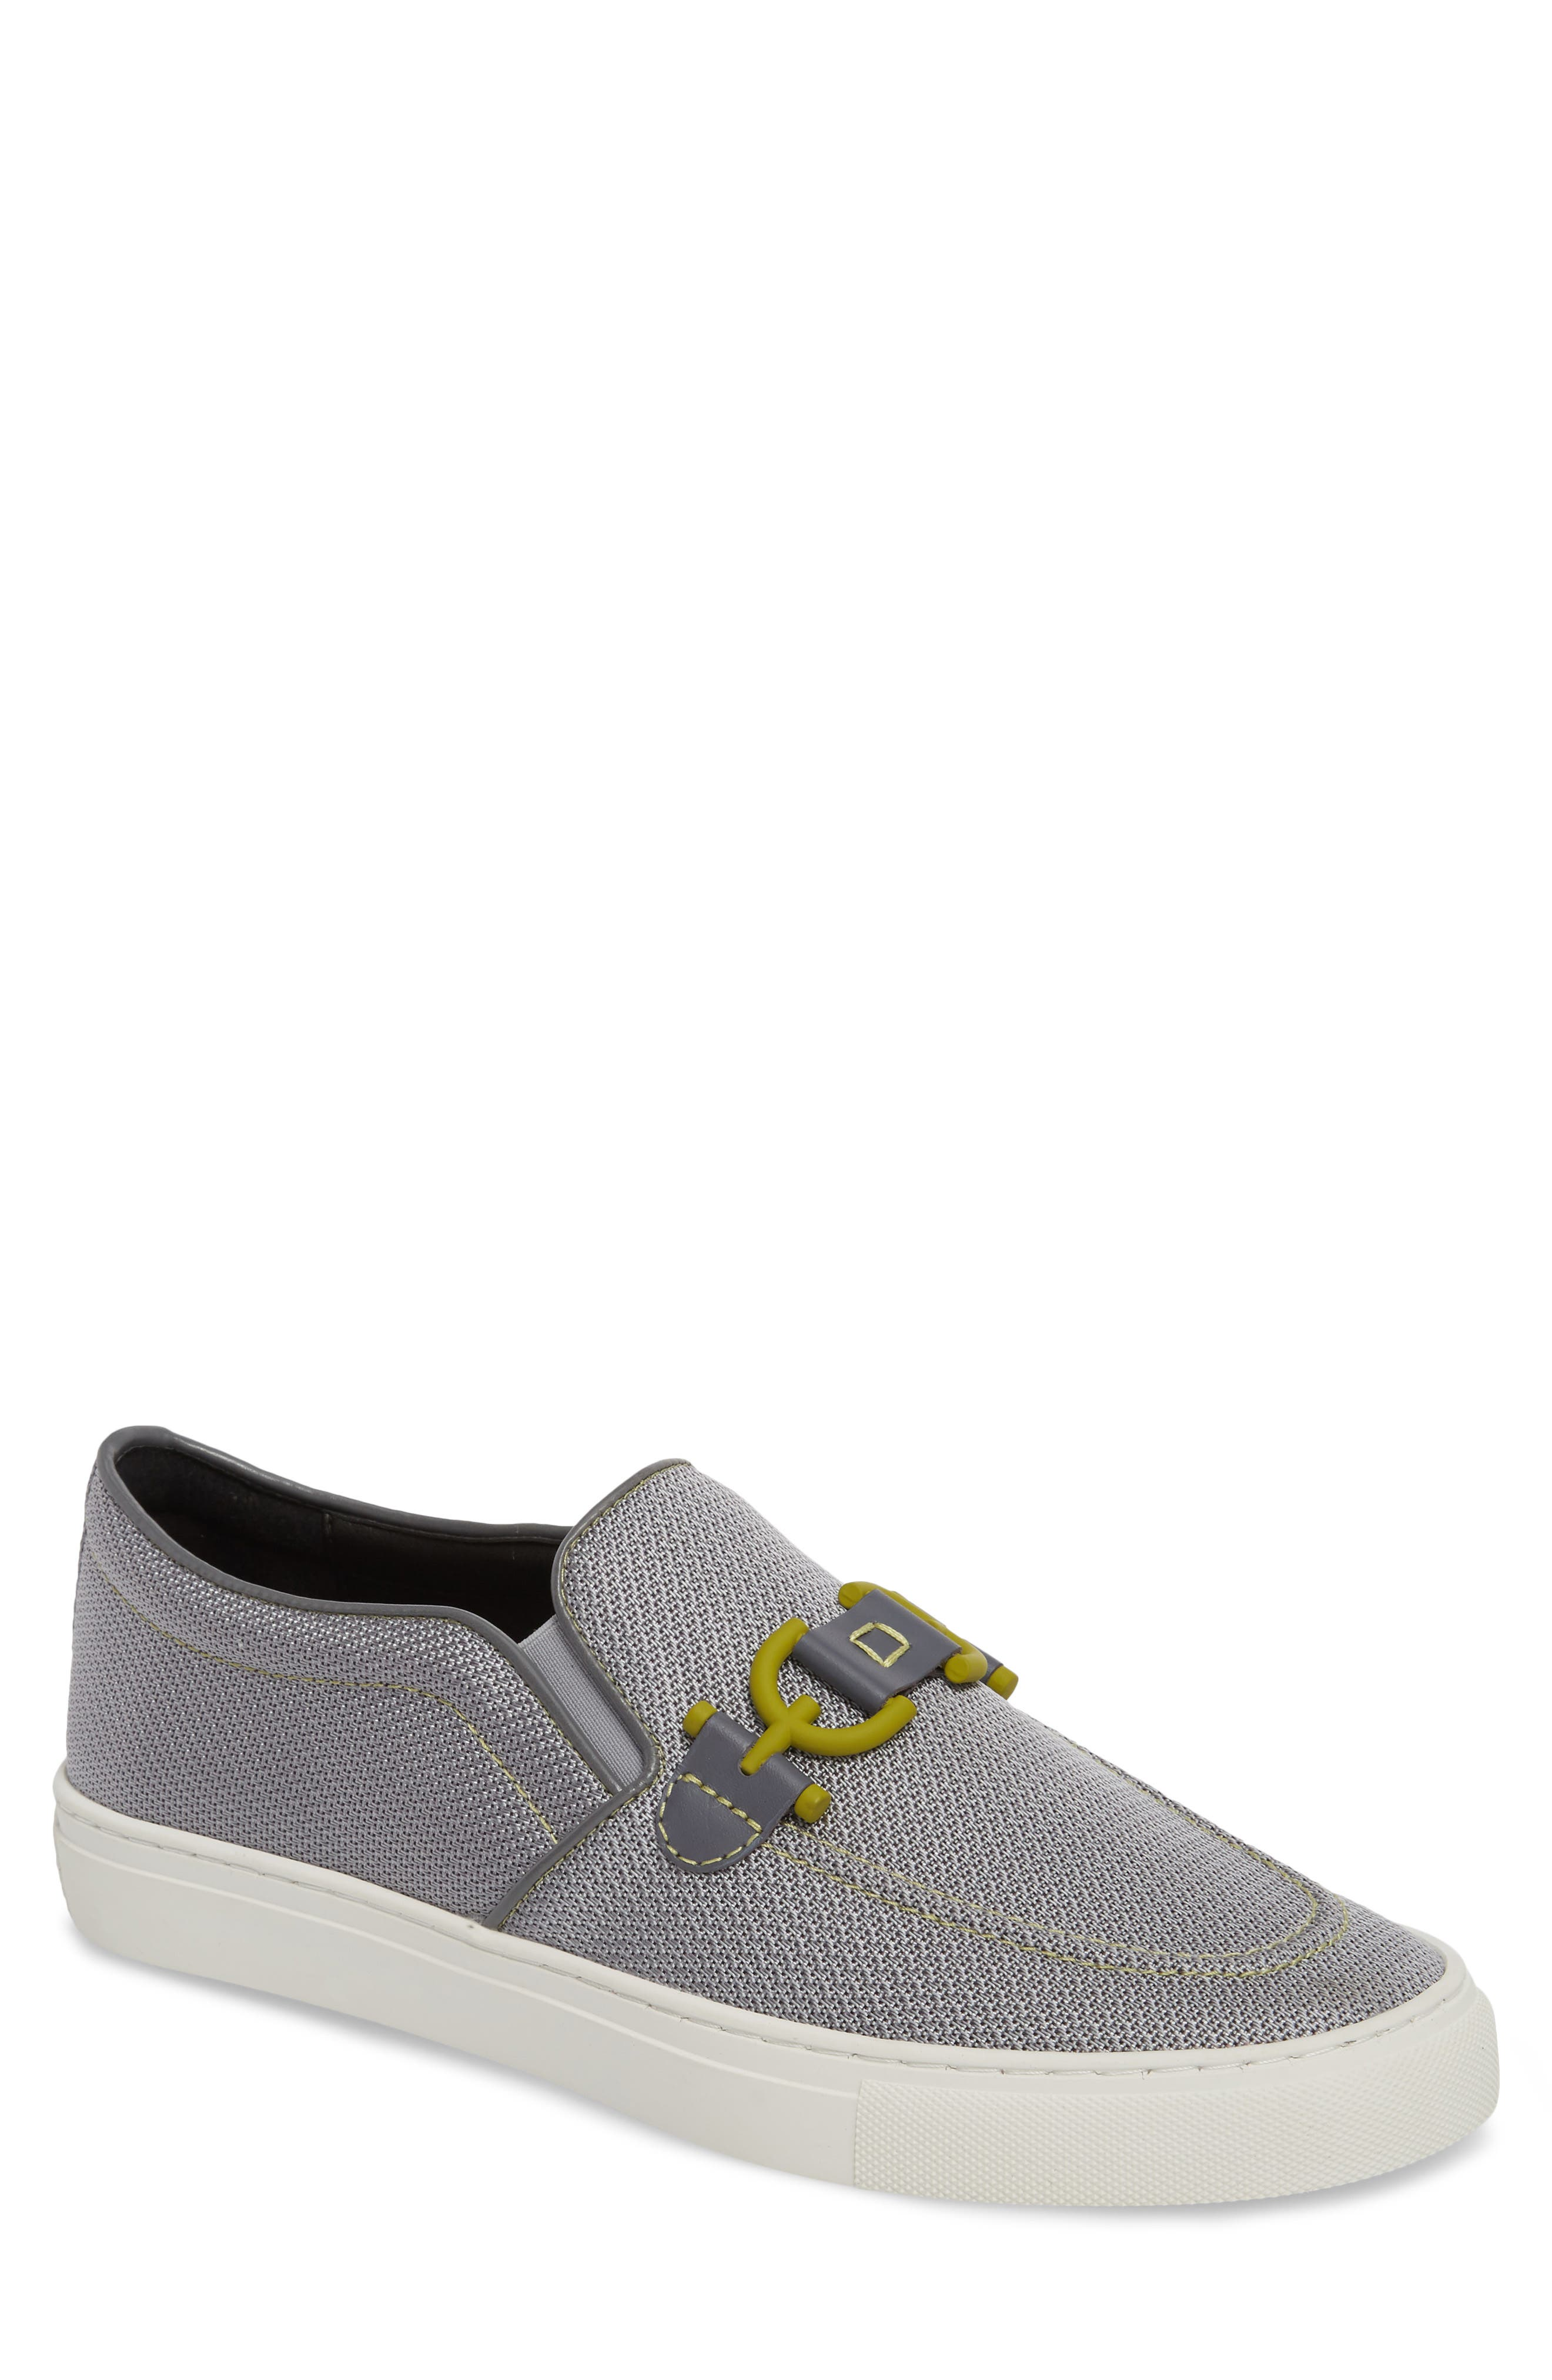 Donald Pliner Andor Bit Slip-On Sneaker (Men)